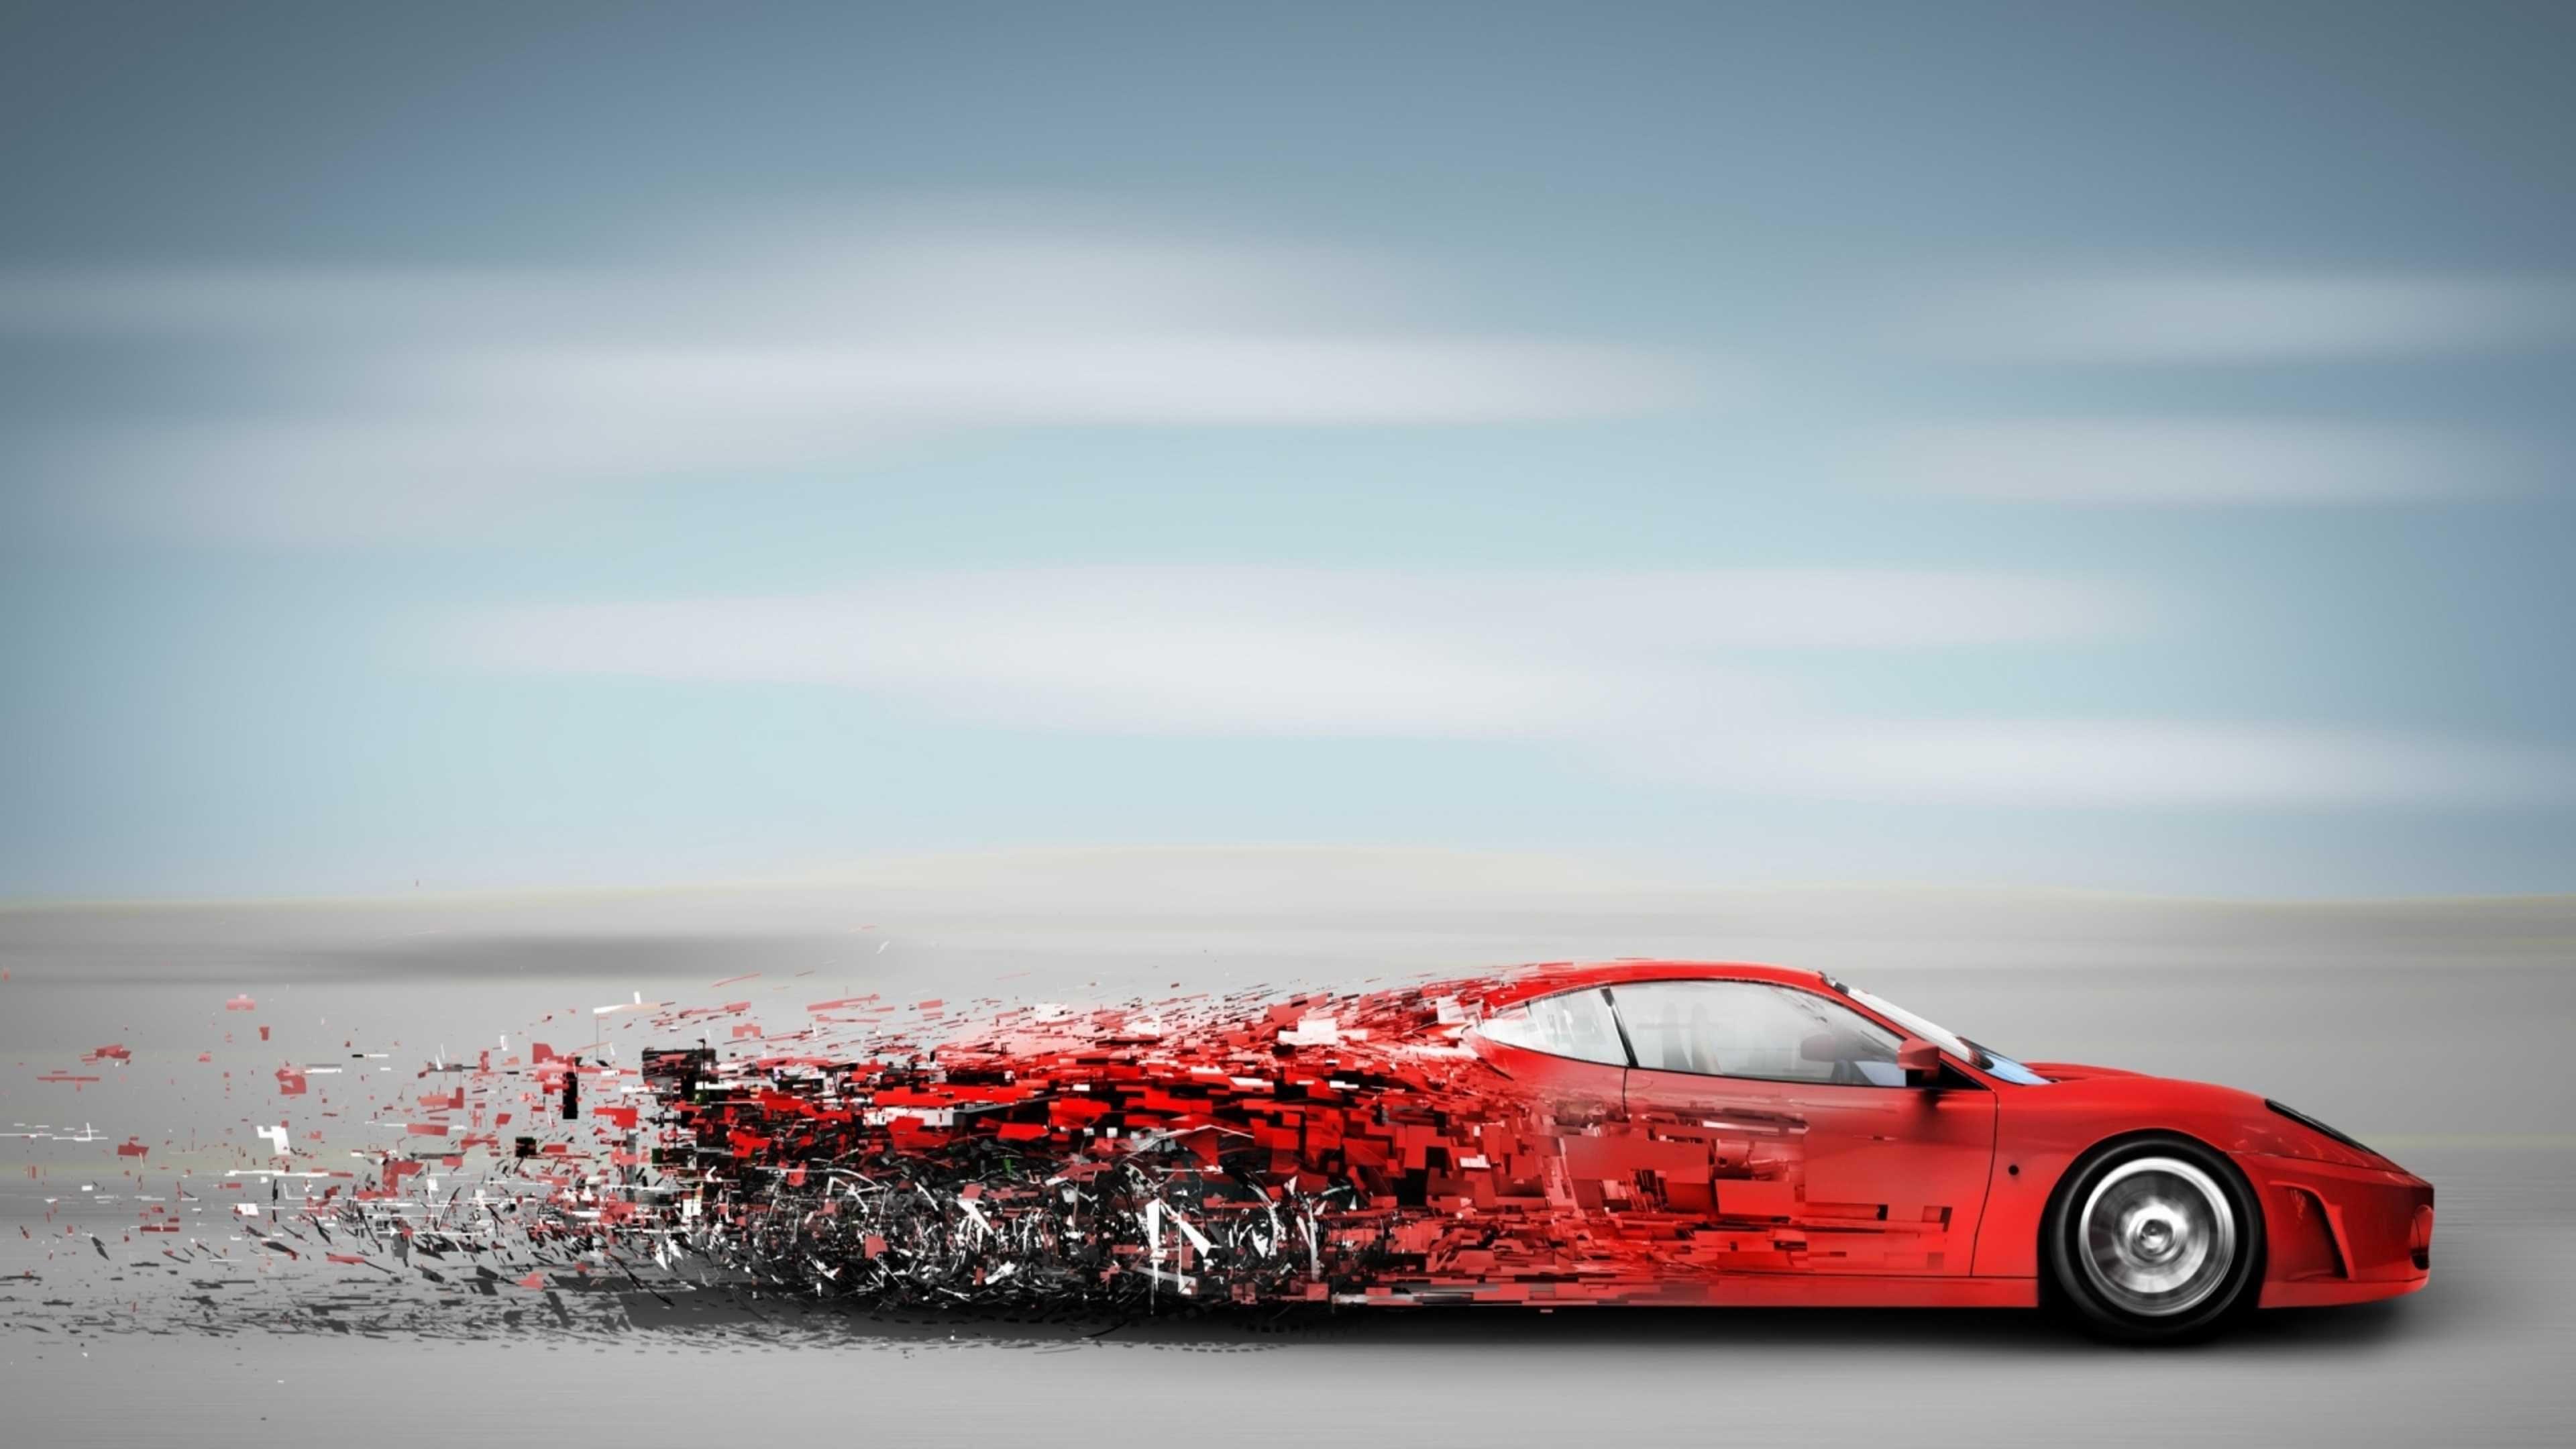 Speed Car Abstract Art K Wallpaper - Car Abstract Wallpaper 4k - HD Wallpaper